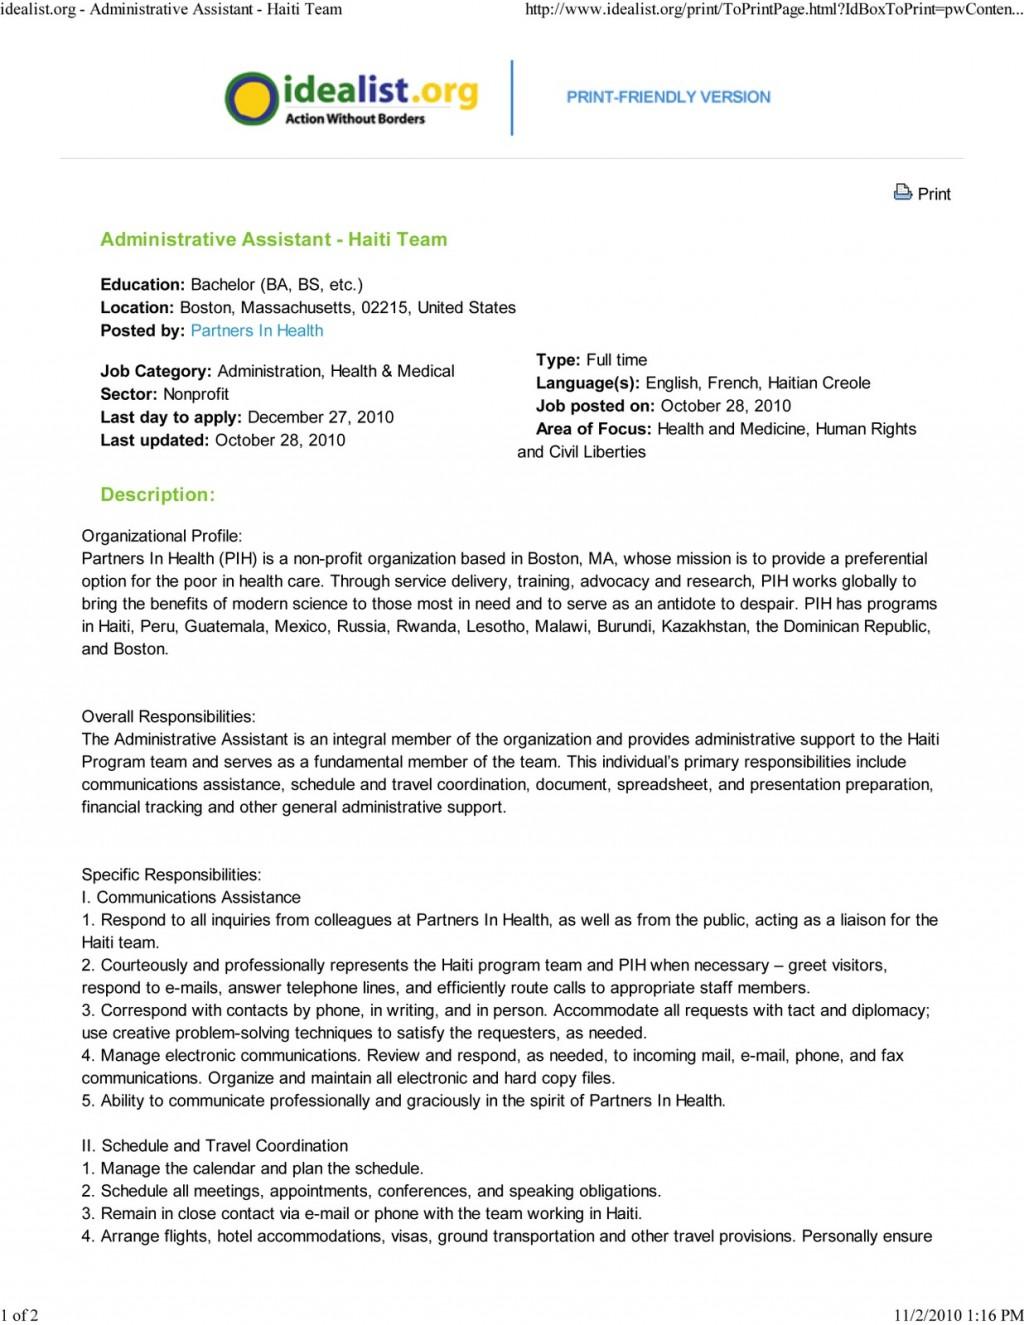 016 Admin2bassistant Essay Example Virginia Tech Phenomenal Essays Reddit Prompts 2018 Sat Requirements Large